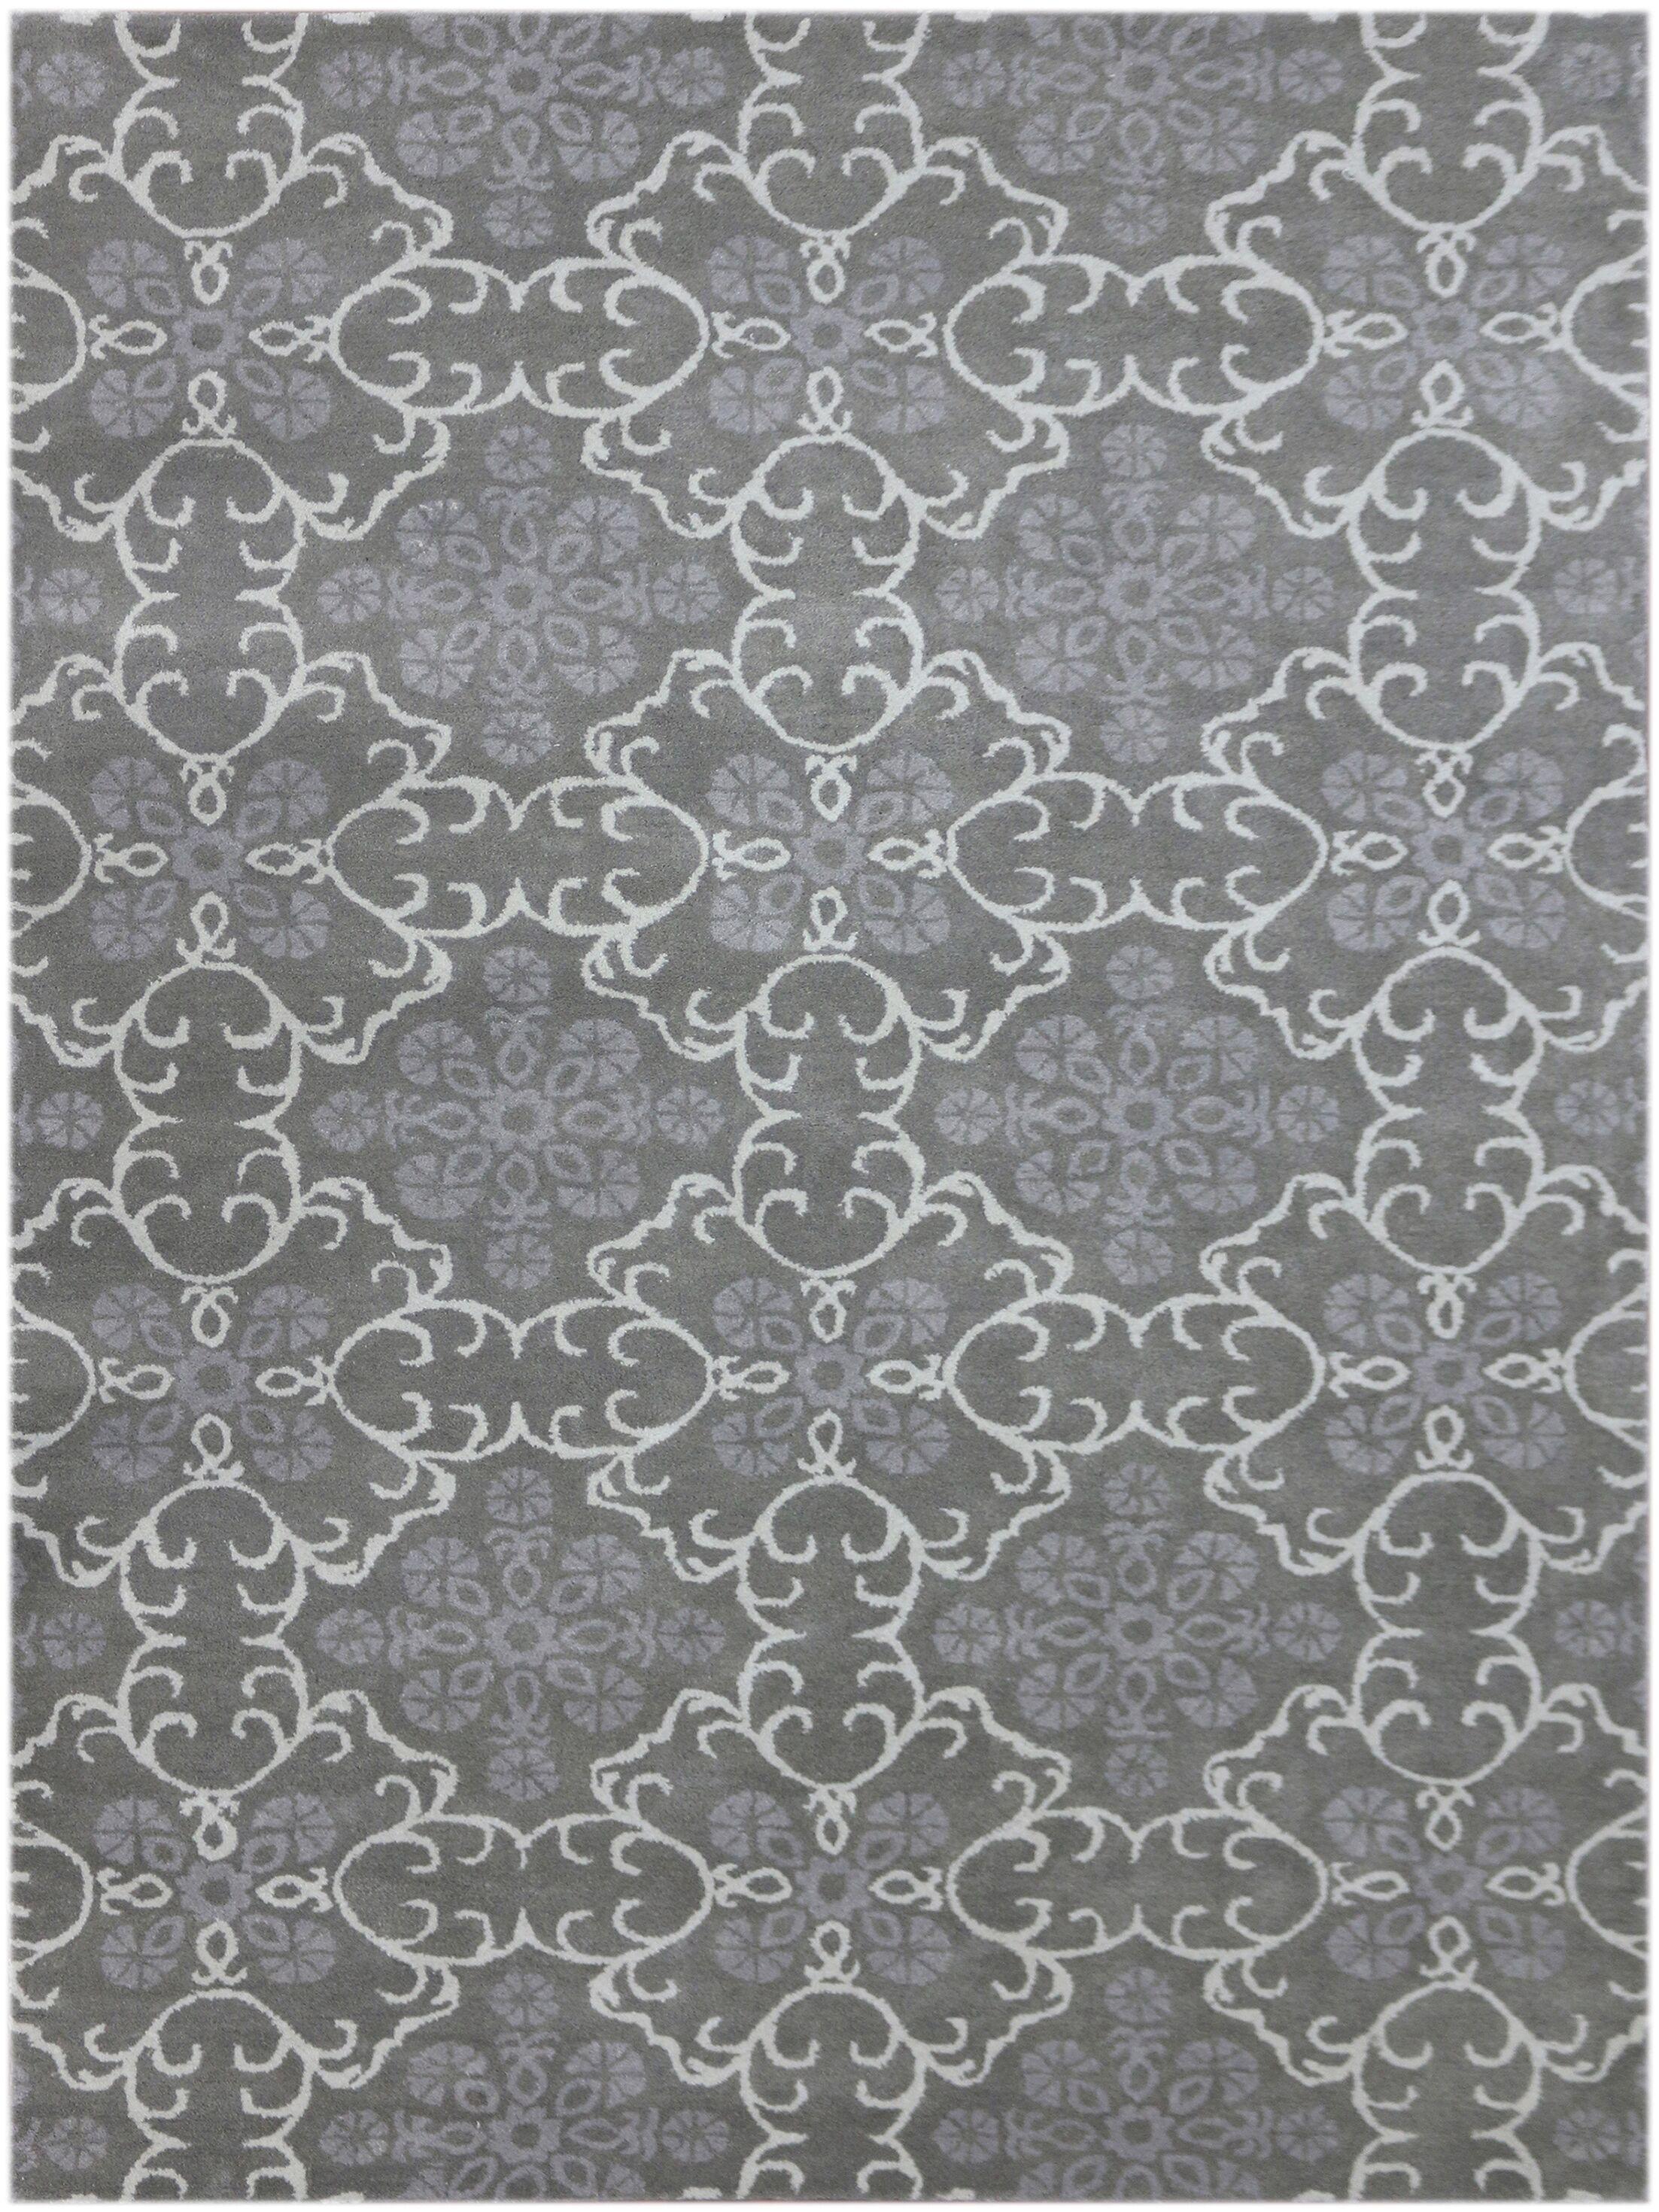 Kaydence Hand-Tufted Dove Gray Area Rug Rug Size: Rectangle 5' x 8'